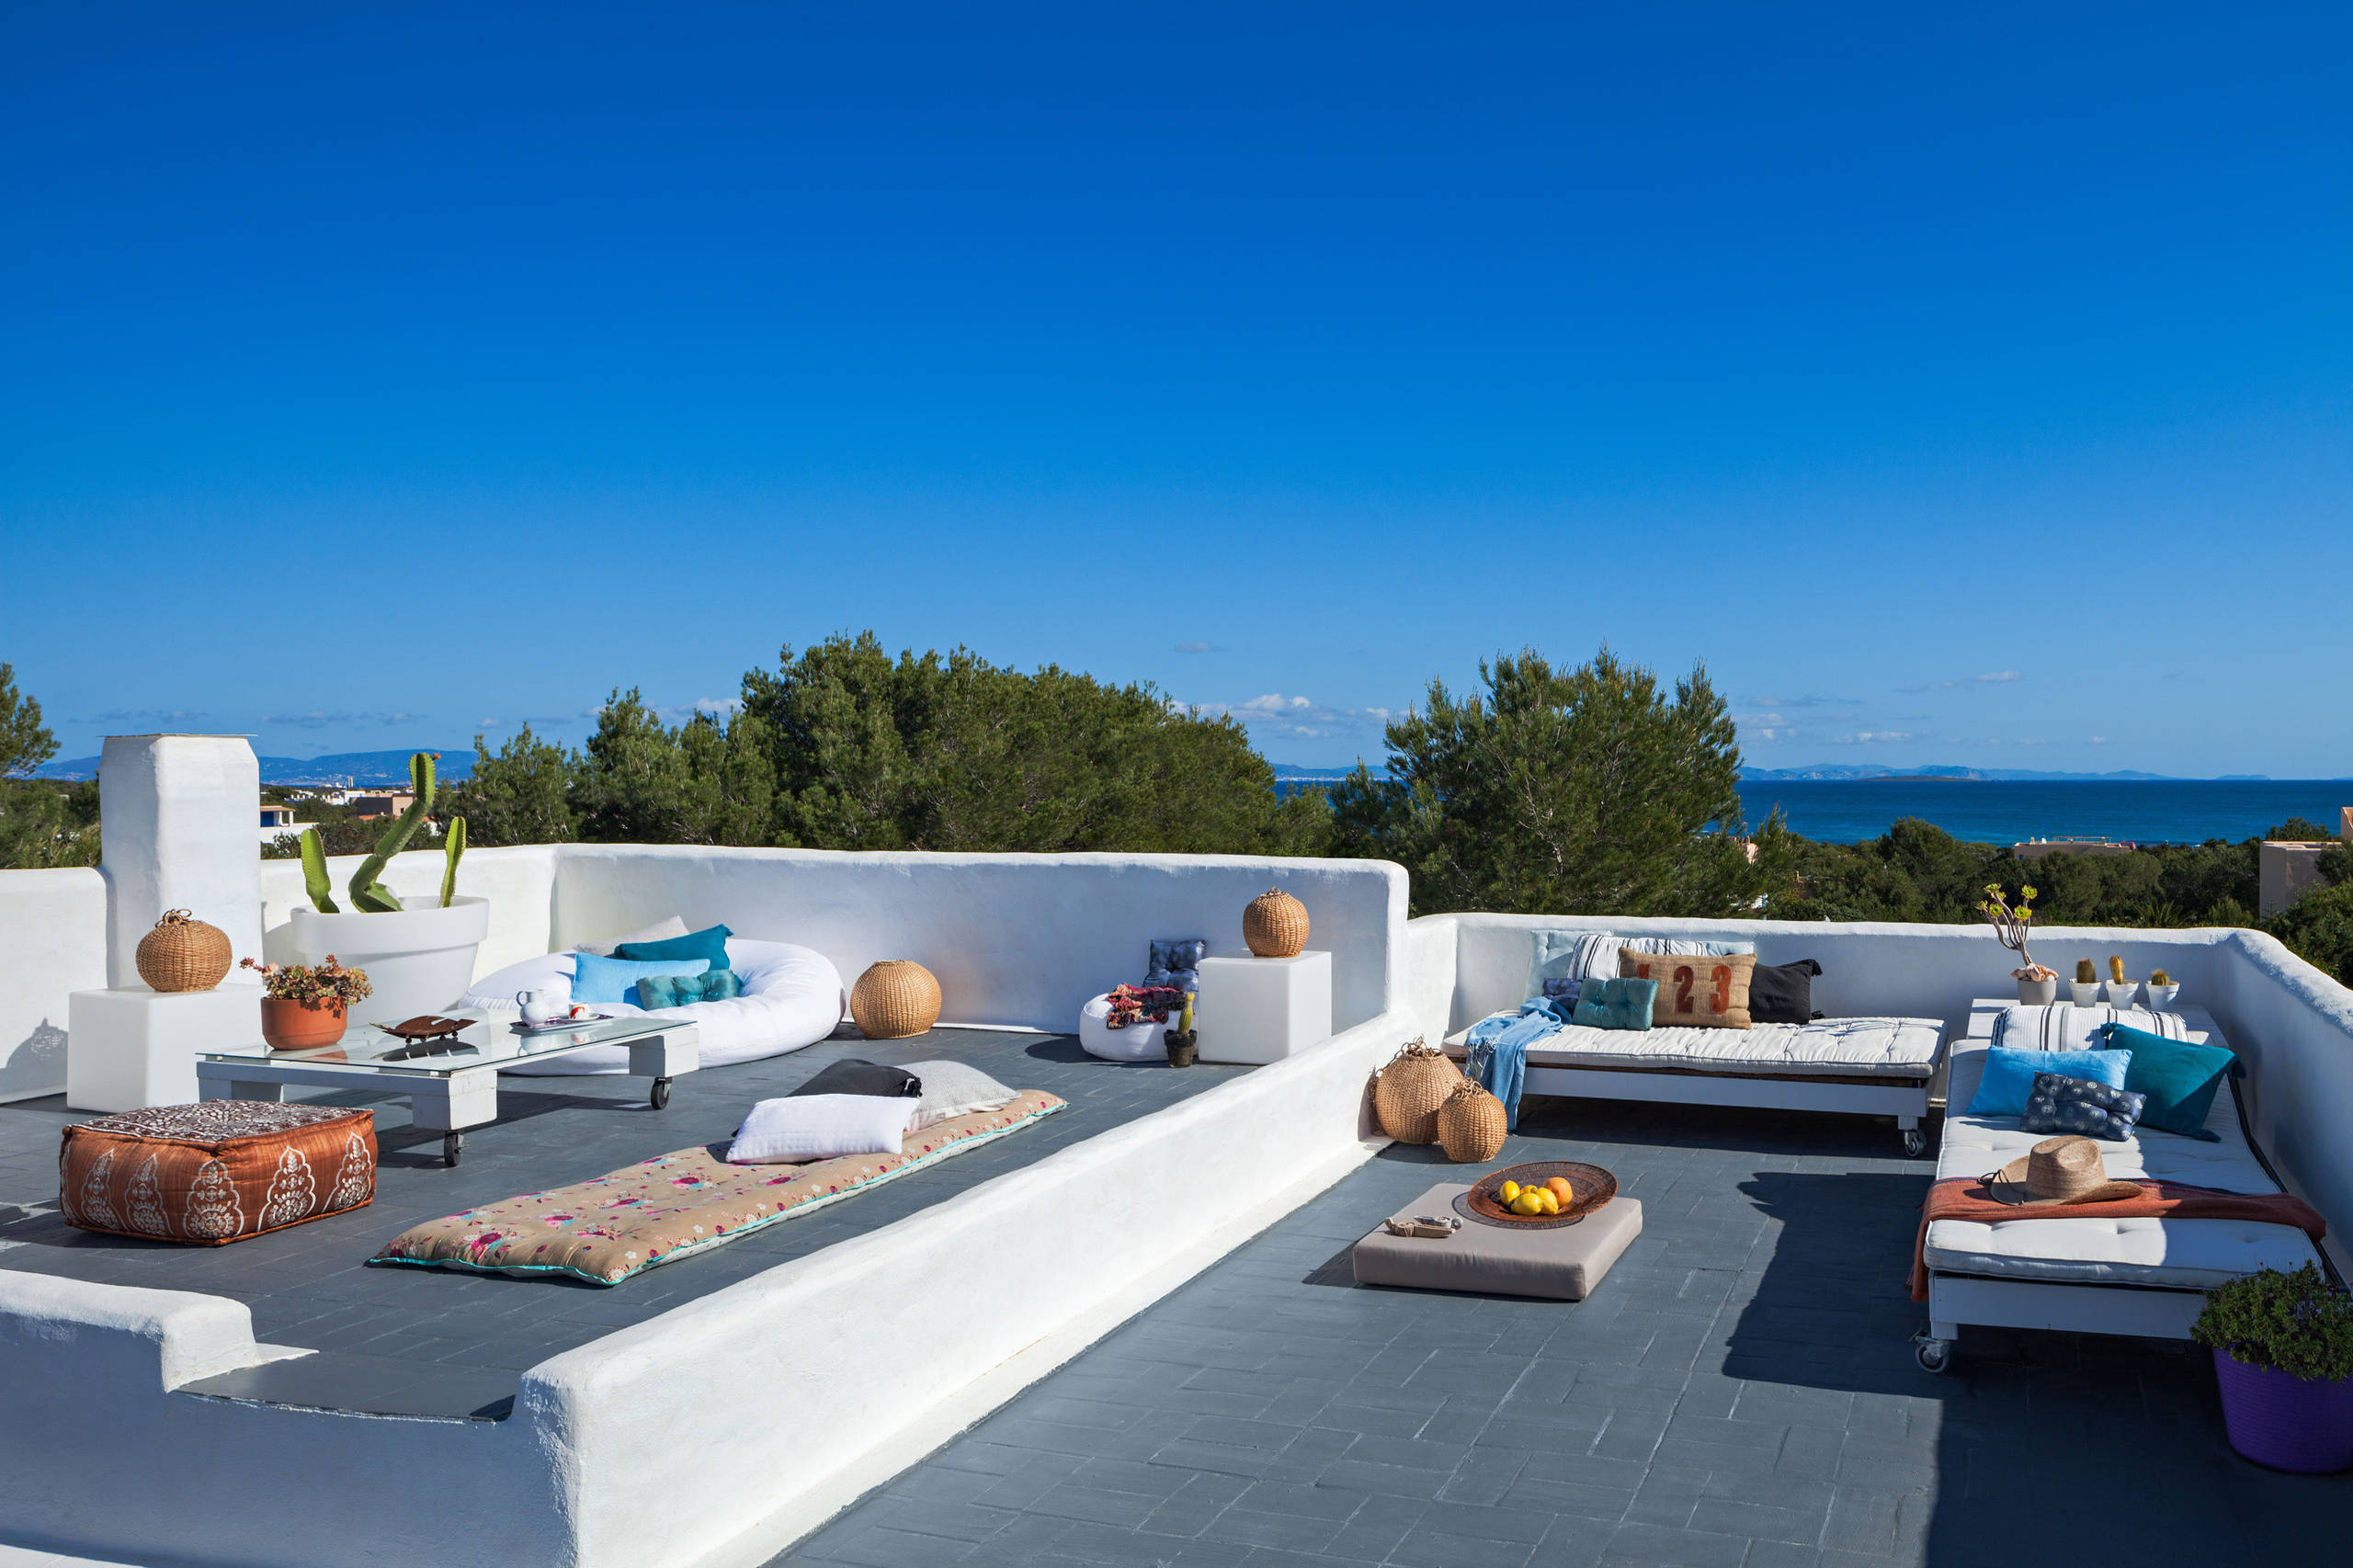 16 Good-looking Mediterranean Deck Designs For The Summer